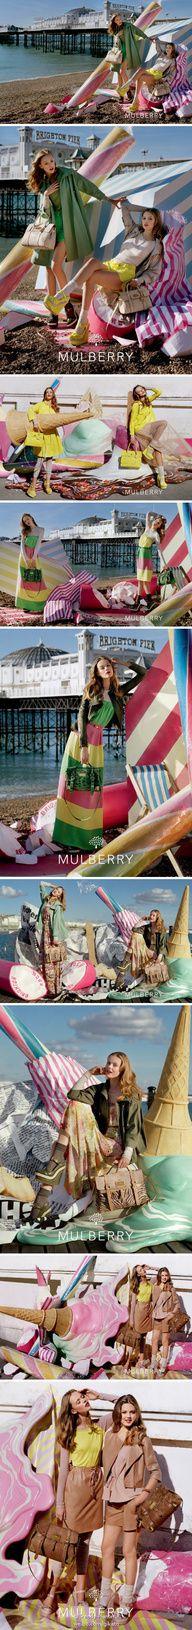 Mulberry handbags uk,mulberry sale,mulberry outlet,mulberry purses,mulberry alexa,mulberry bags sale, http://www.mulberryhandbagsuk.eu mulberry bags outlet,cheap mulberry handbags outlet